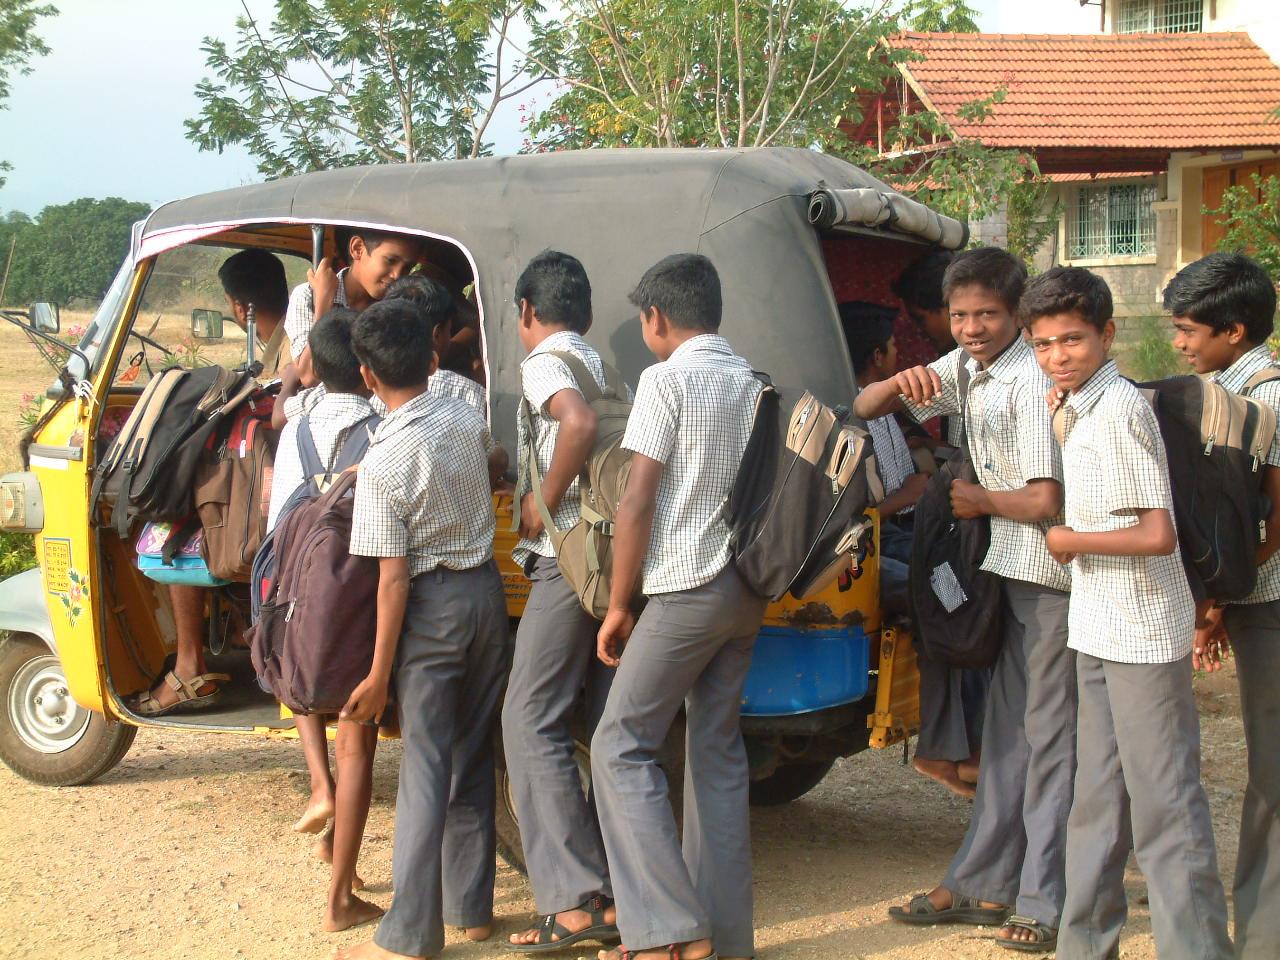 Jnr Boys going to school 01